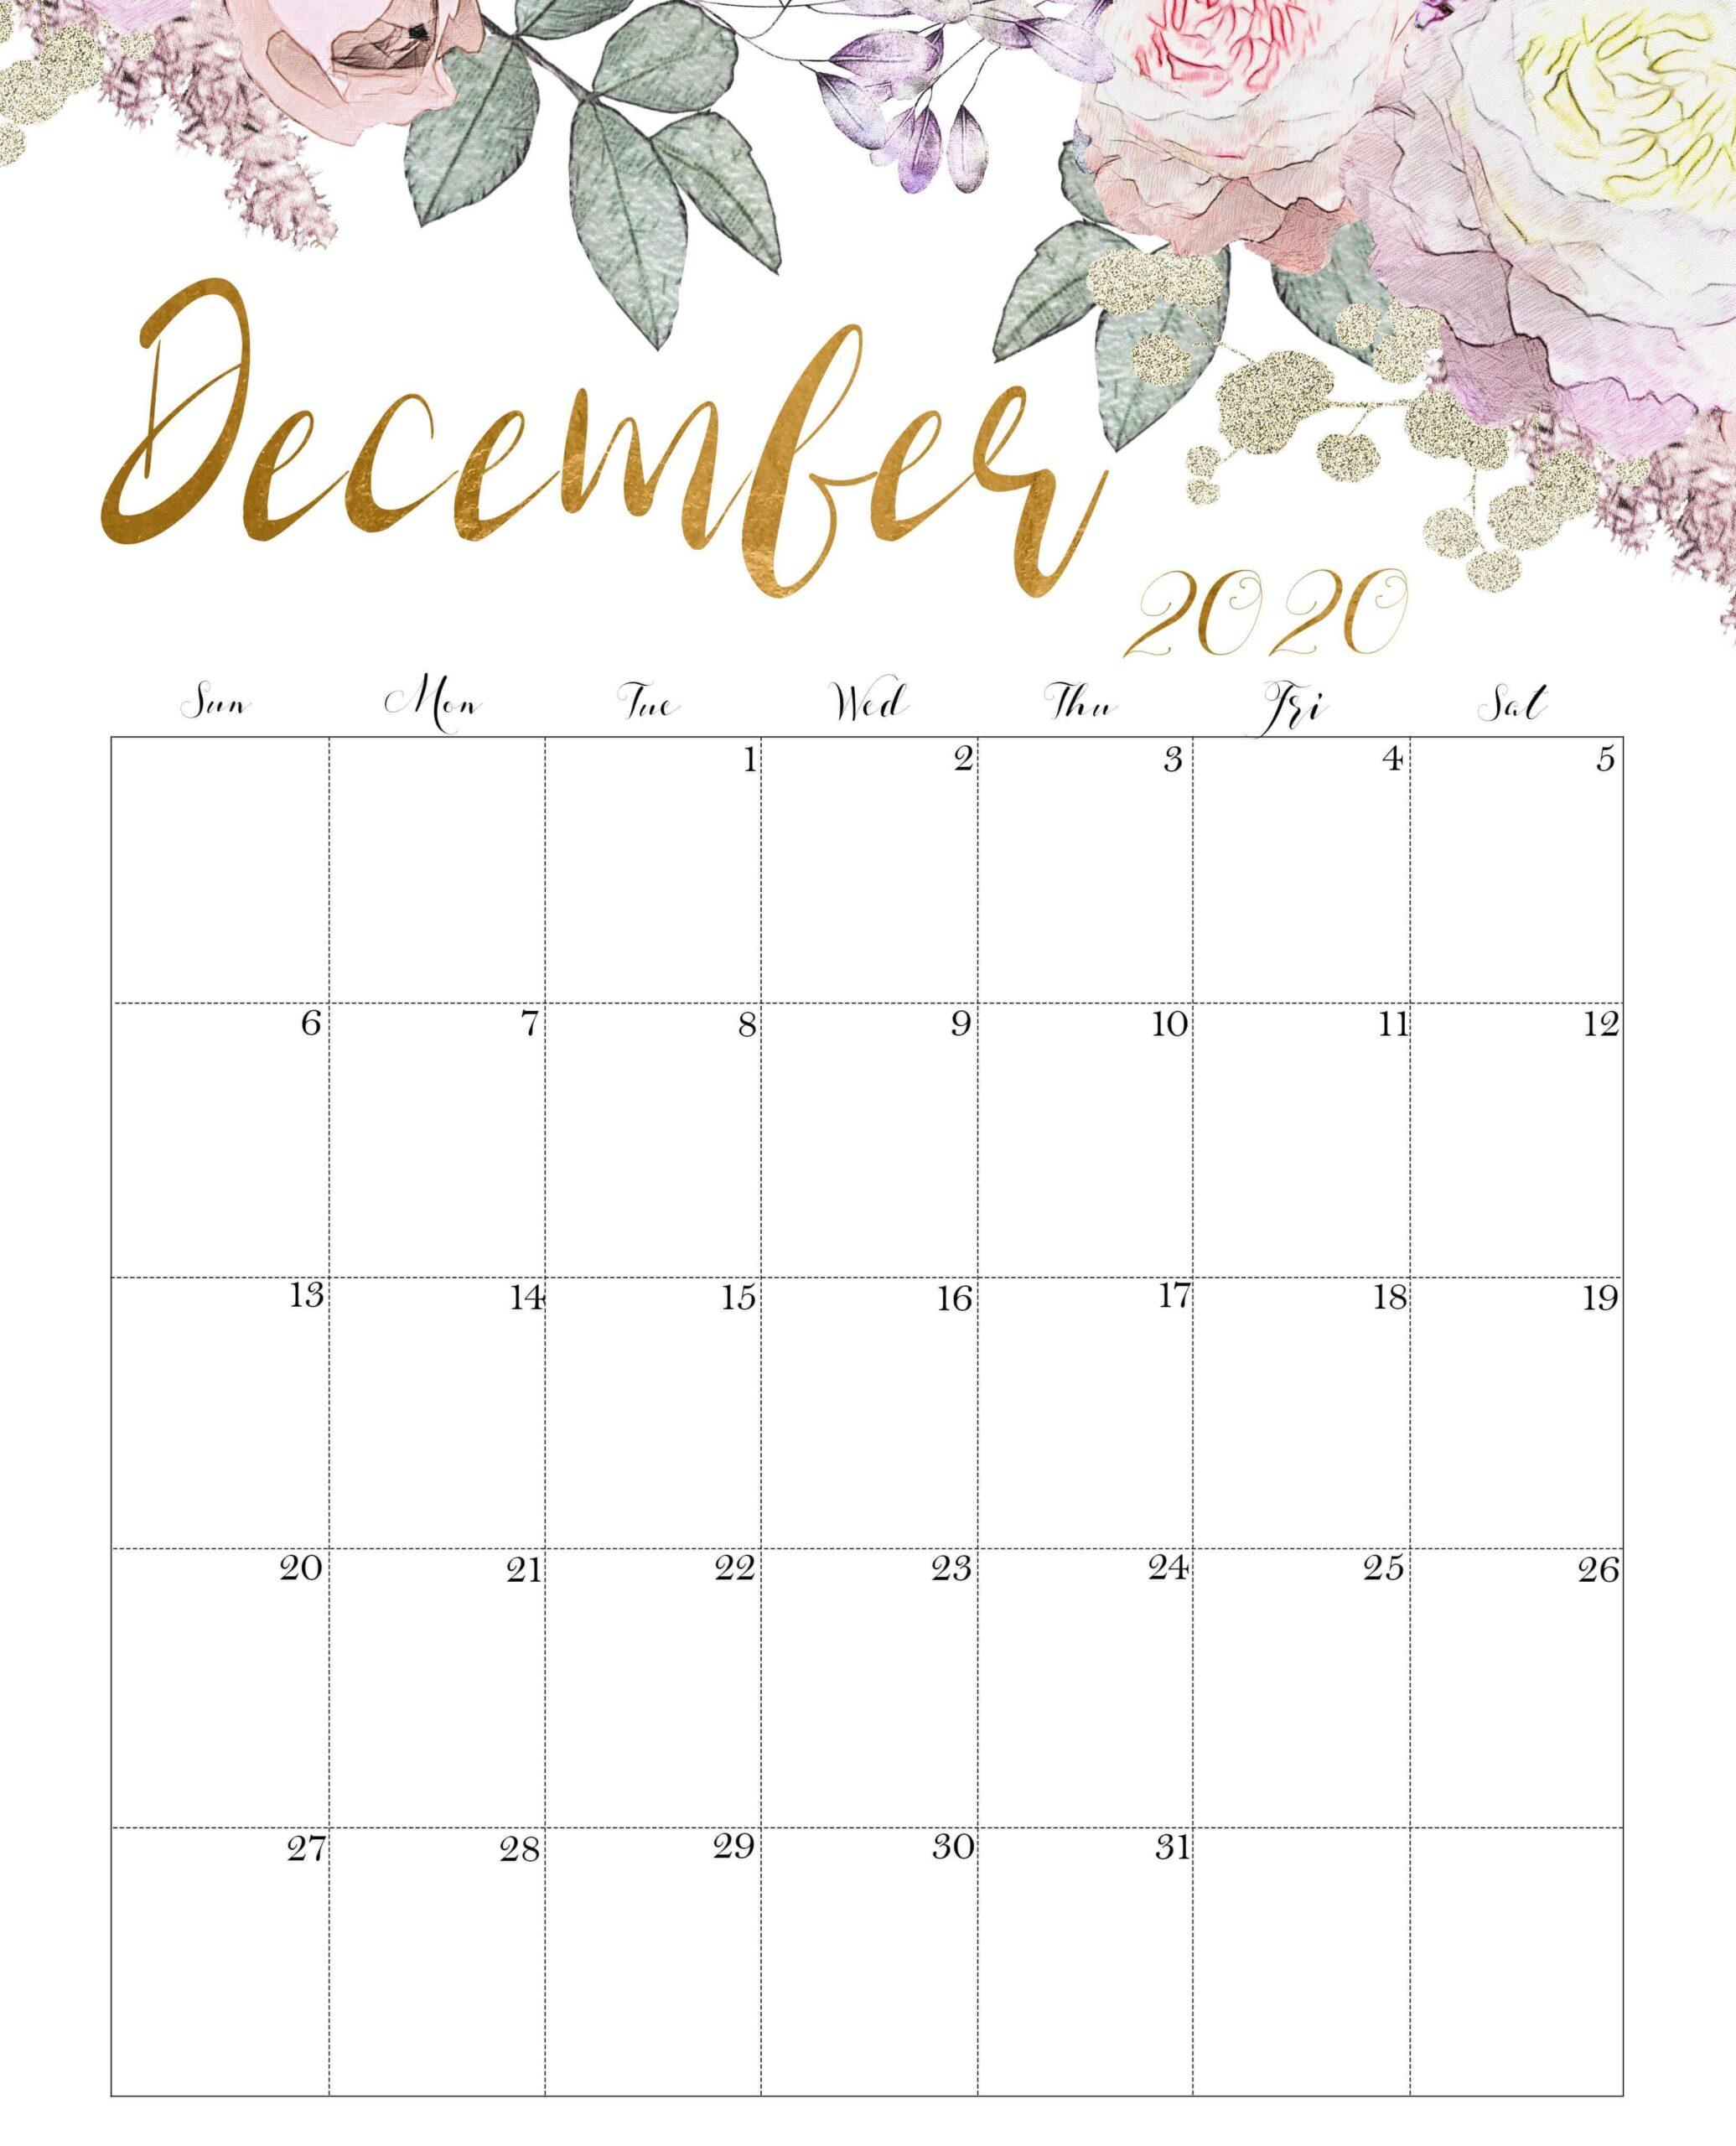 Floral December 2020 Calendar Blank